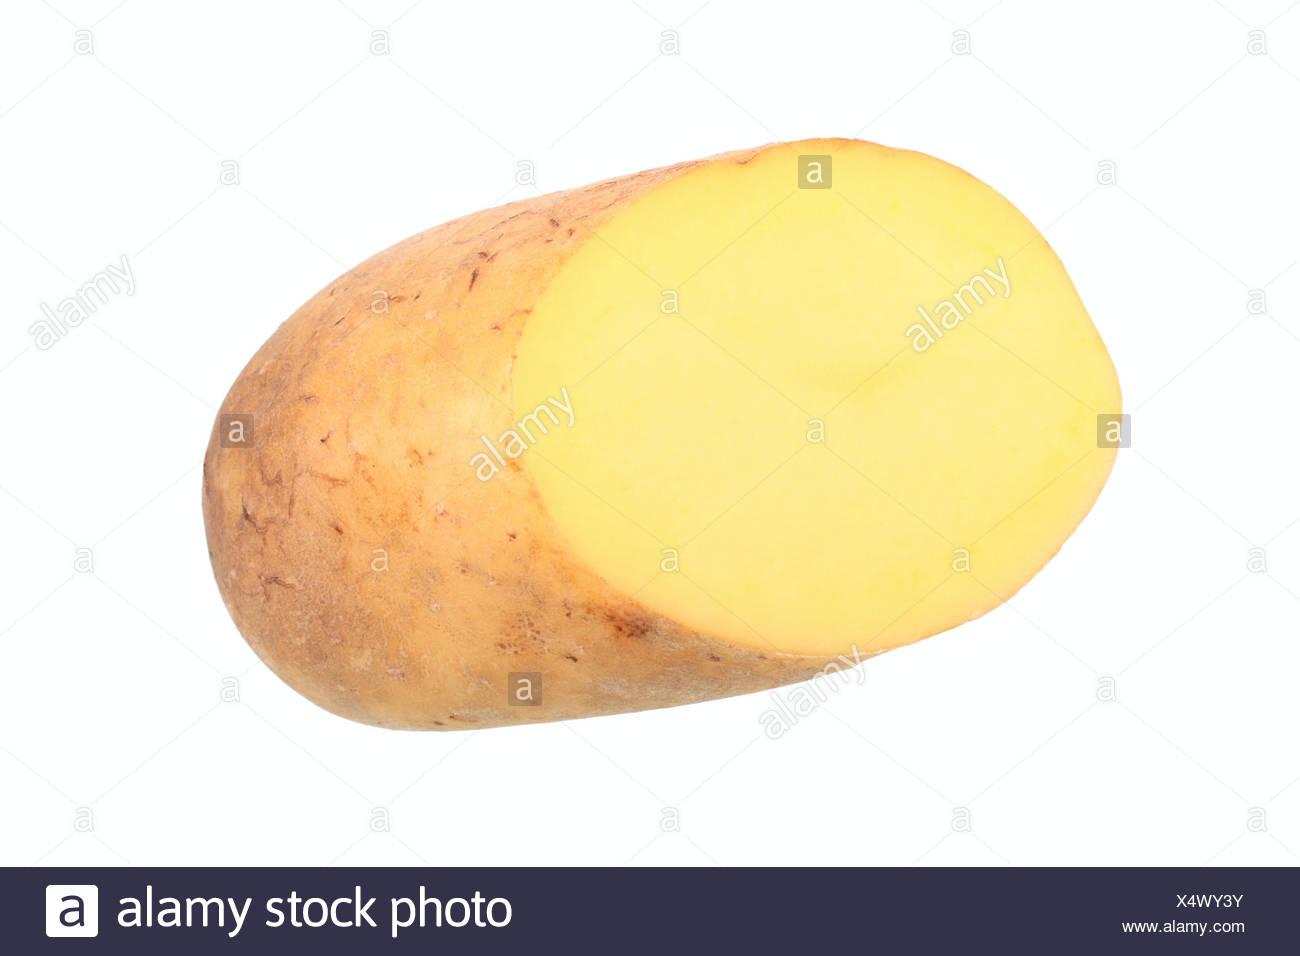 Kartoffel, Talent Sorte, in zwei Hälften geschnitten Stockbild